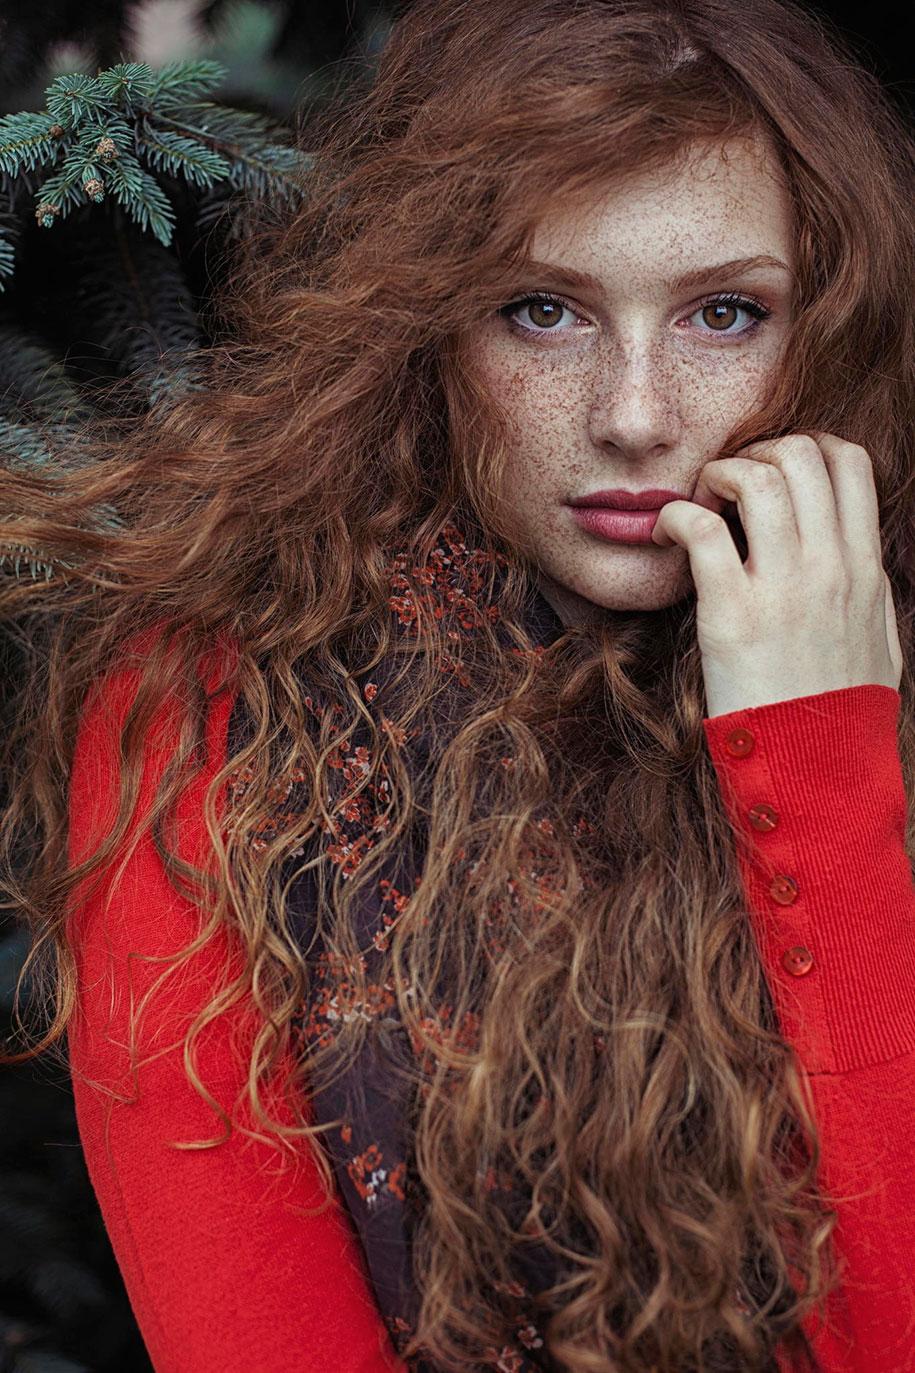 redhead-women-portraits-maja-topcagic-bosnia-herzegovina-8